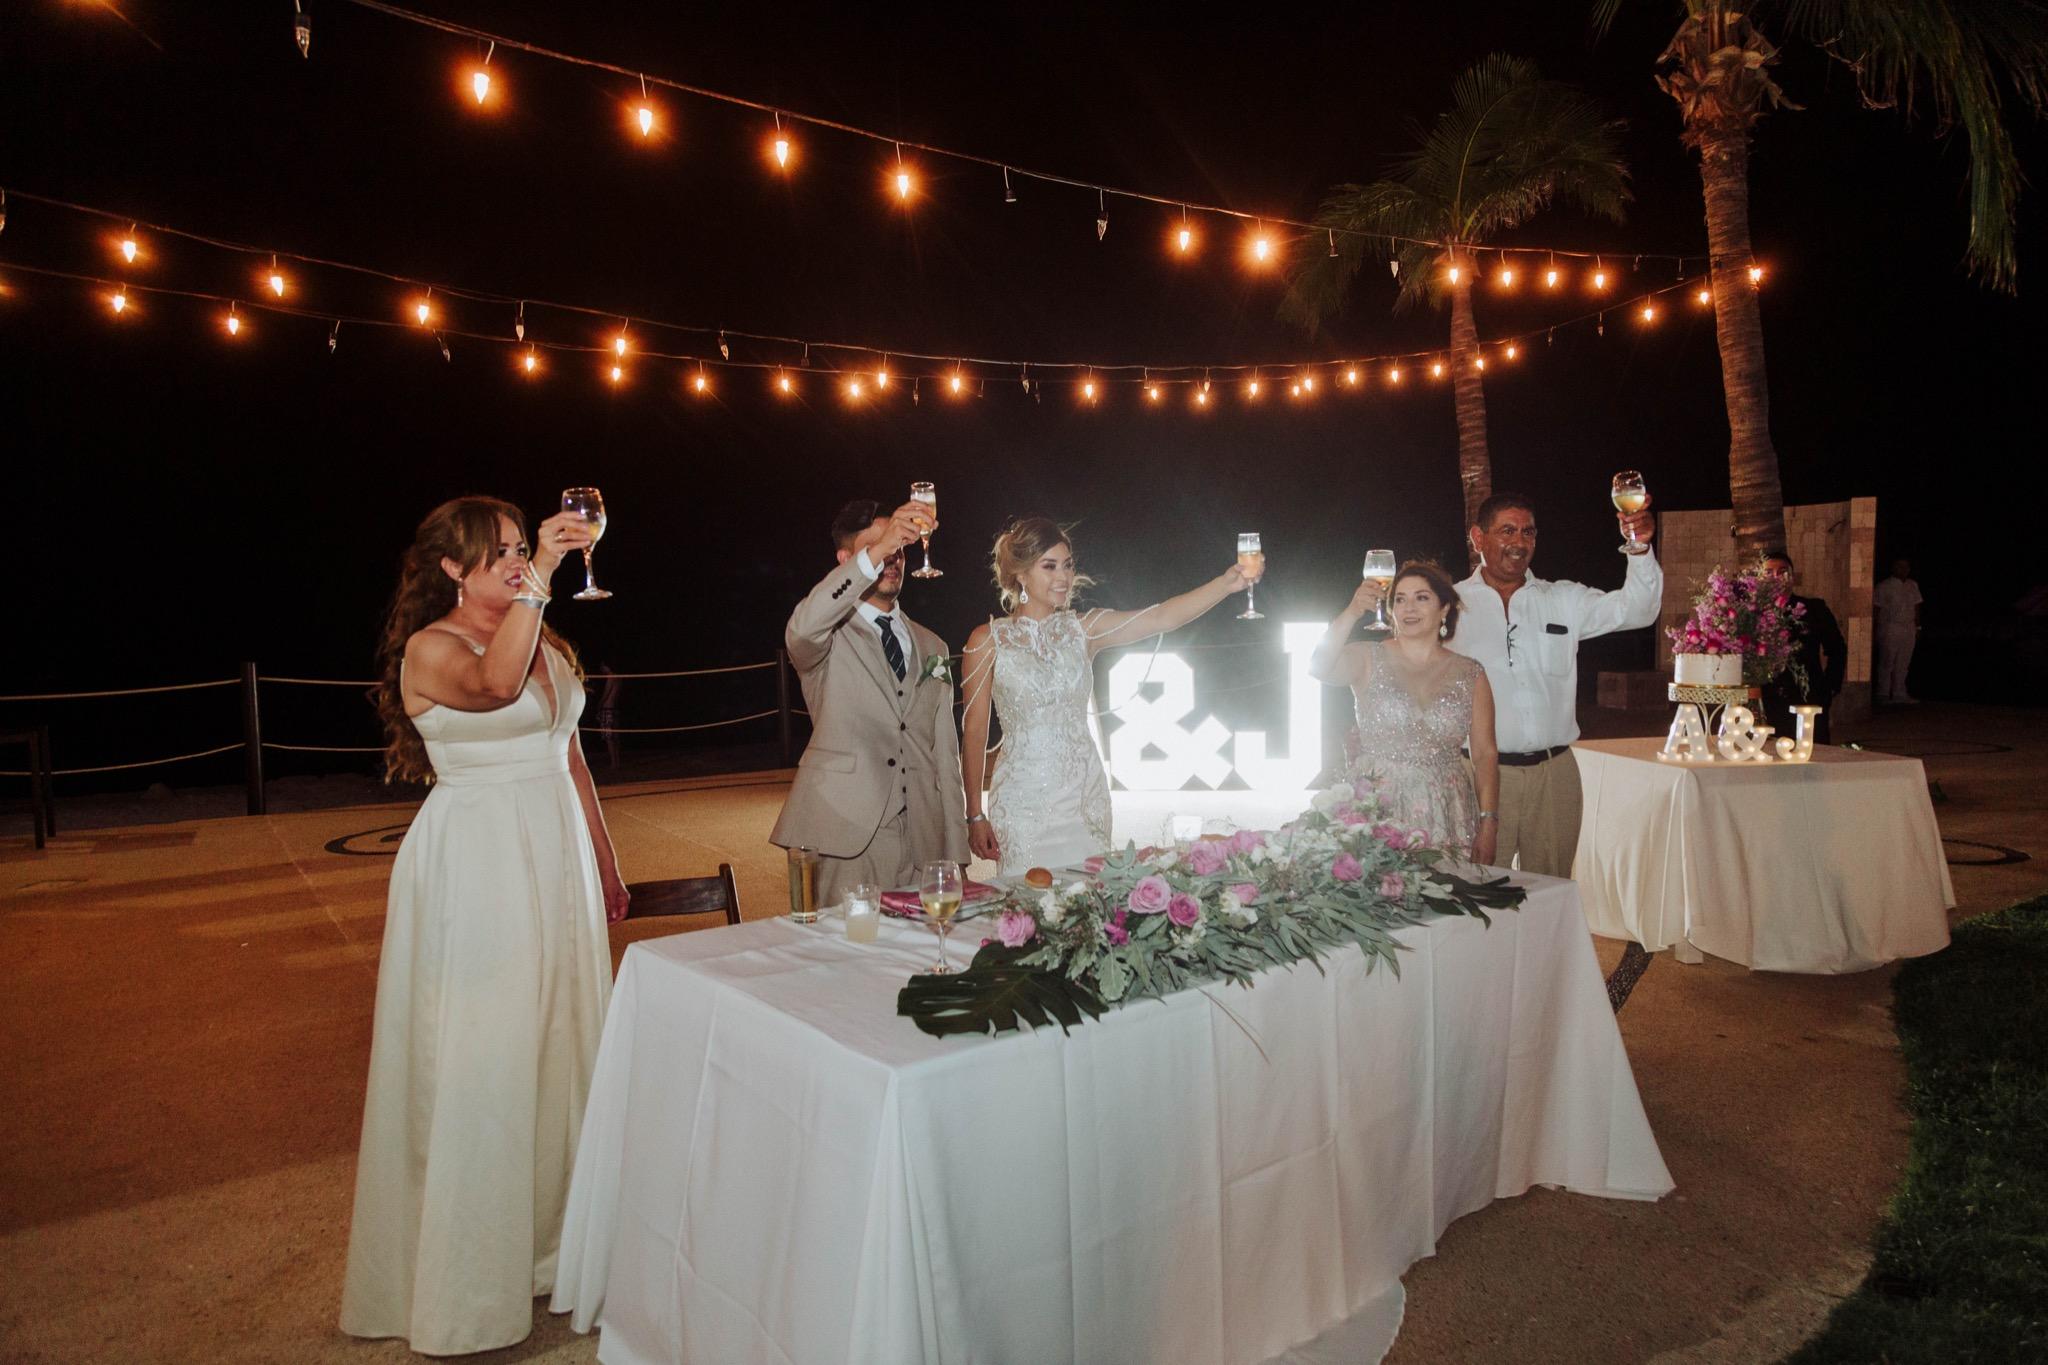 Javier_noriega_fotografo_bodas_profesional_zacatecas_mexico_mazatlan_sinaloa_photographer_weddings73